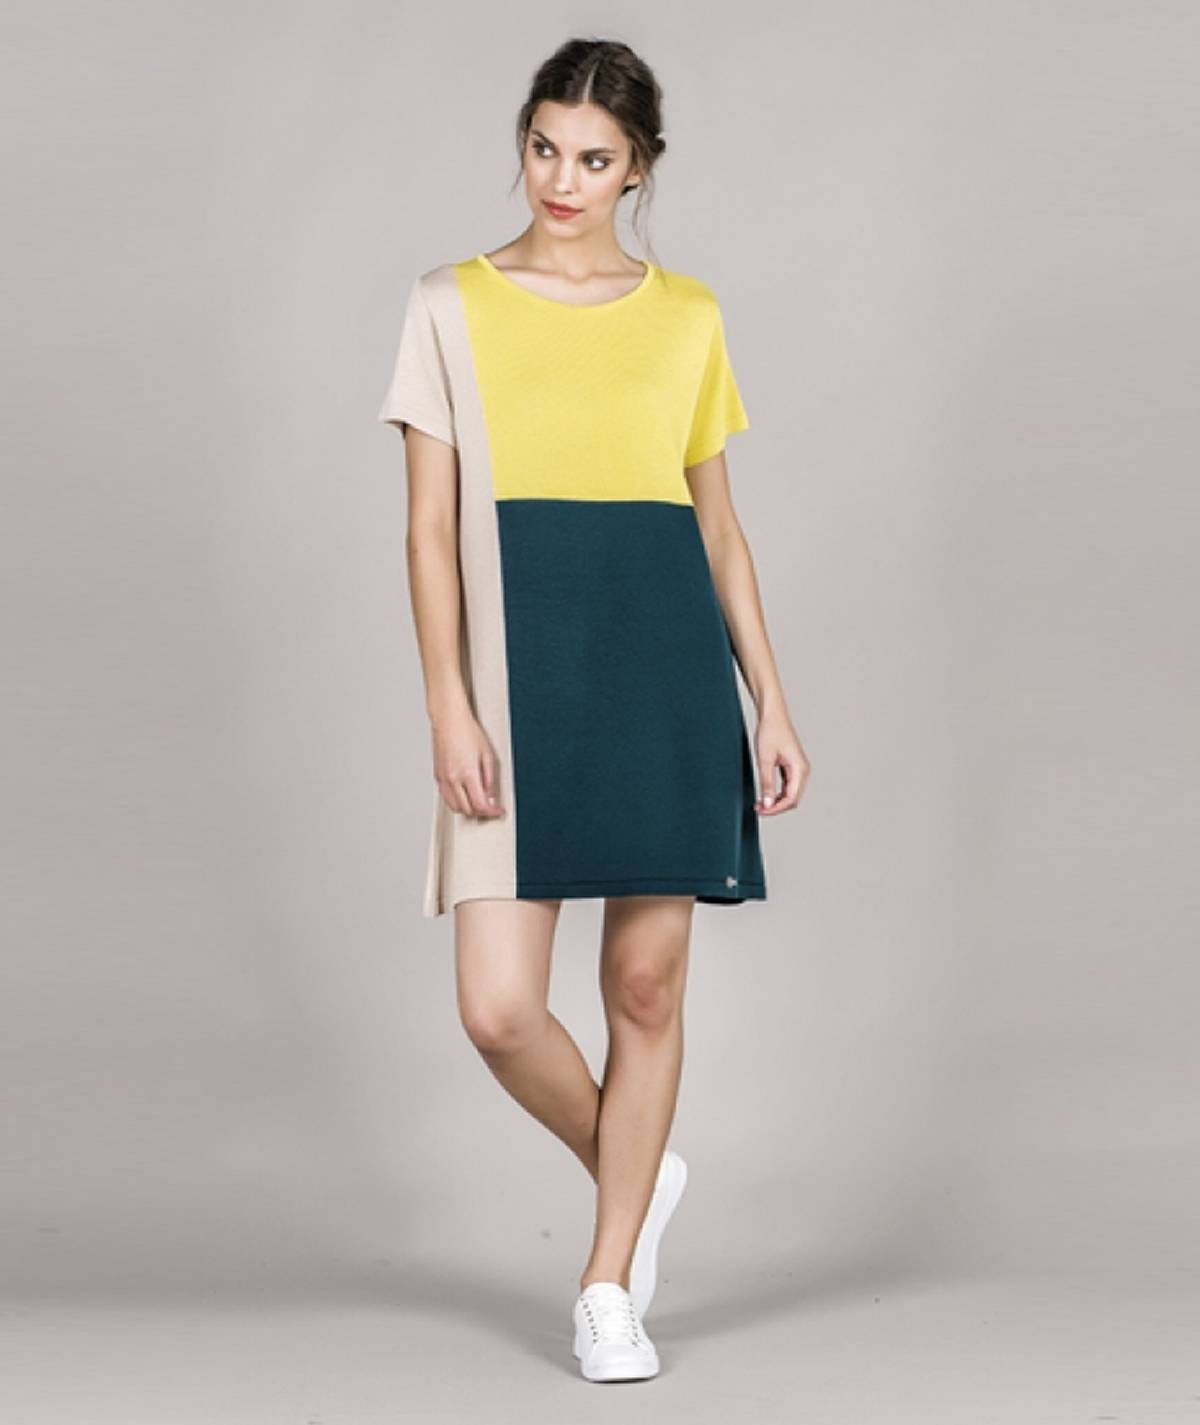 [CHIESSY] Vestido três cores